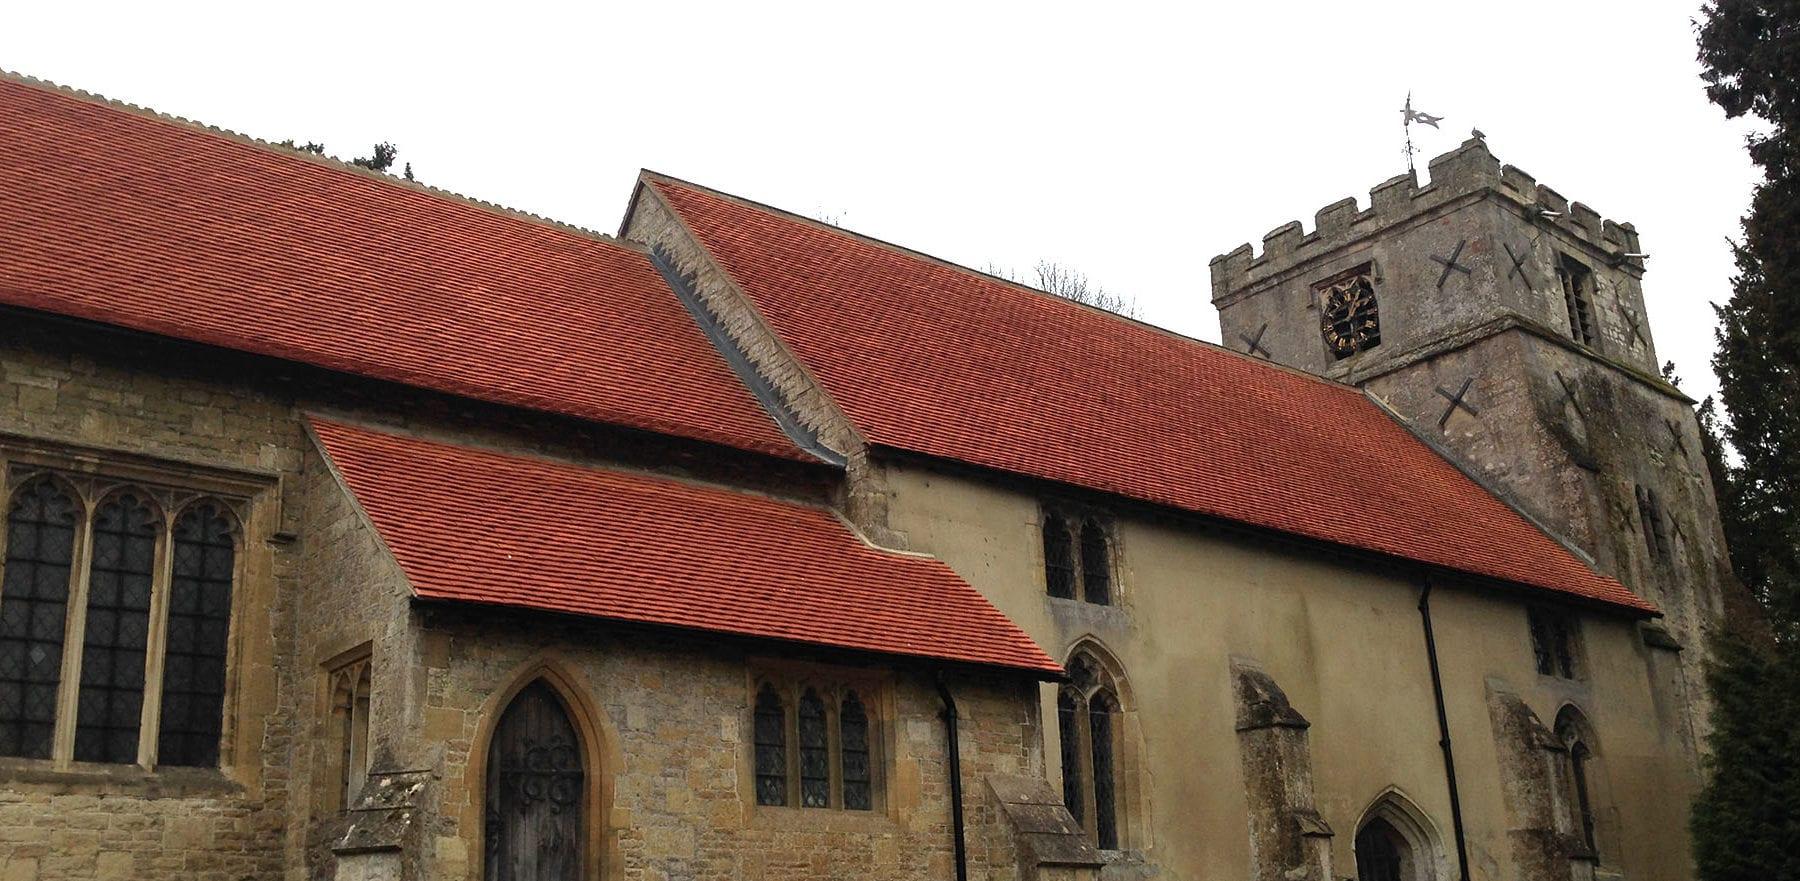 Lifestiles - Handcrafted Orange Clay Roof Tiles - Letcombe, England 4